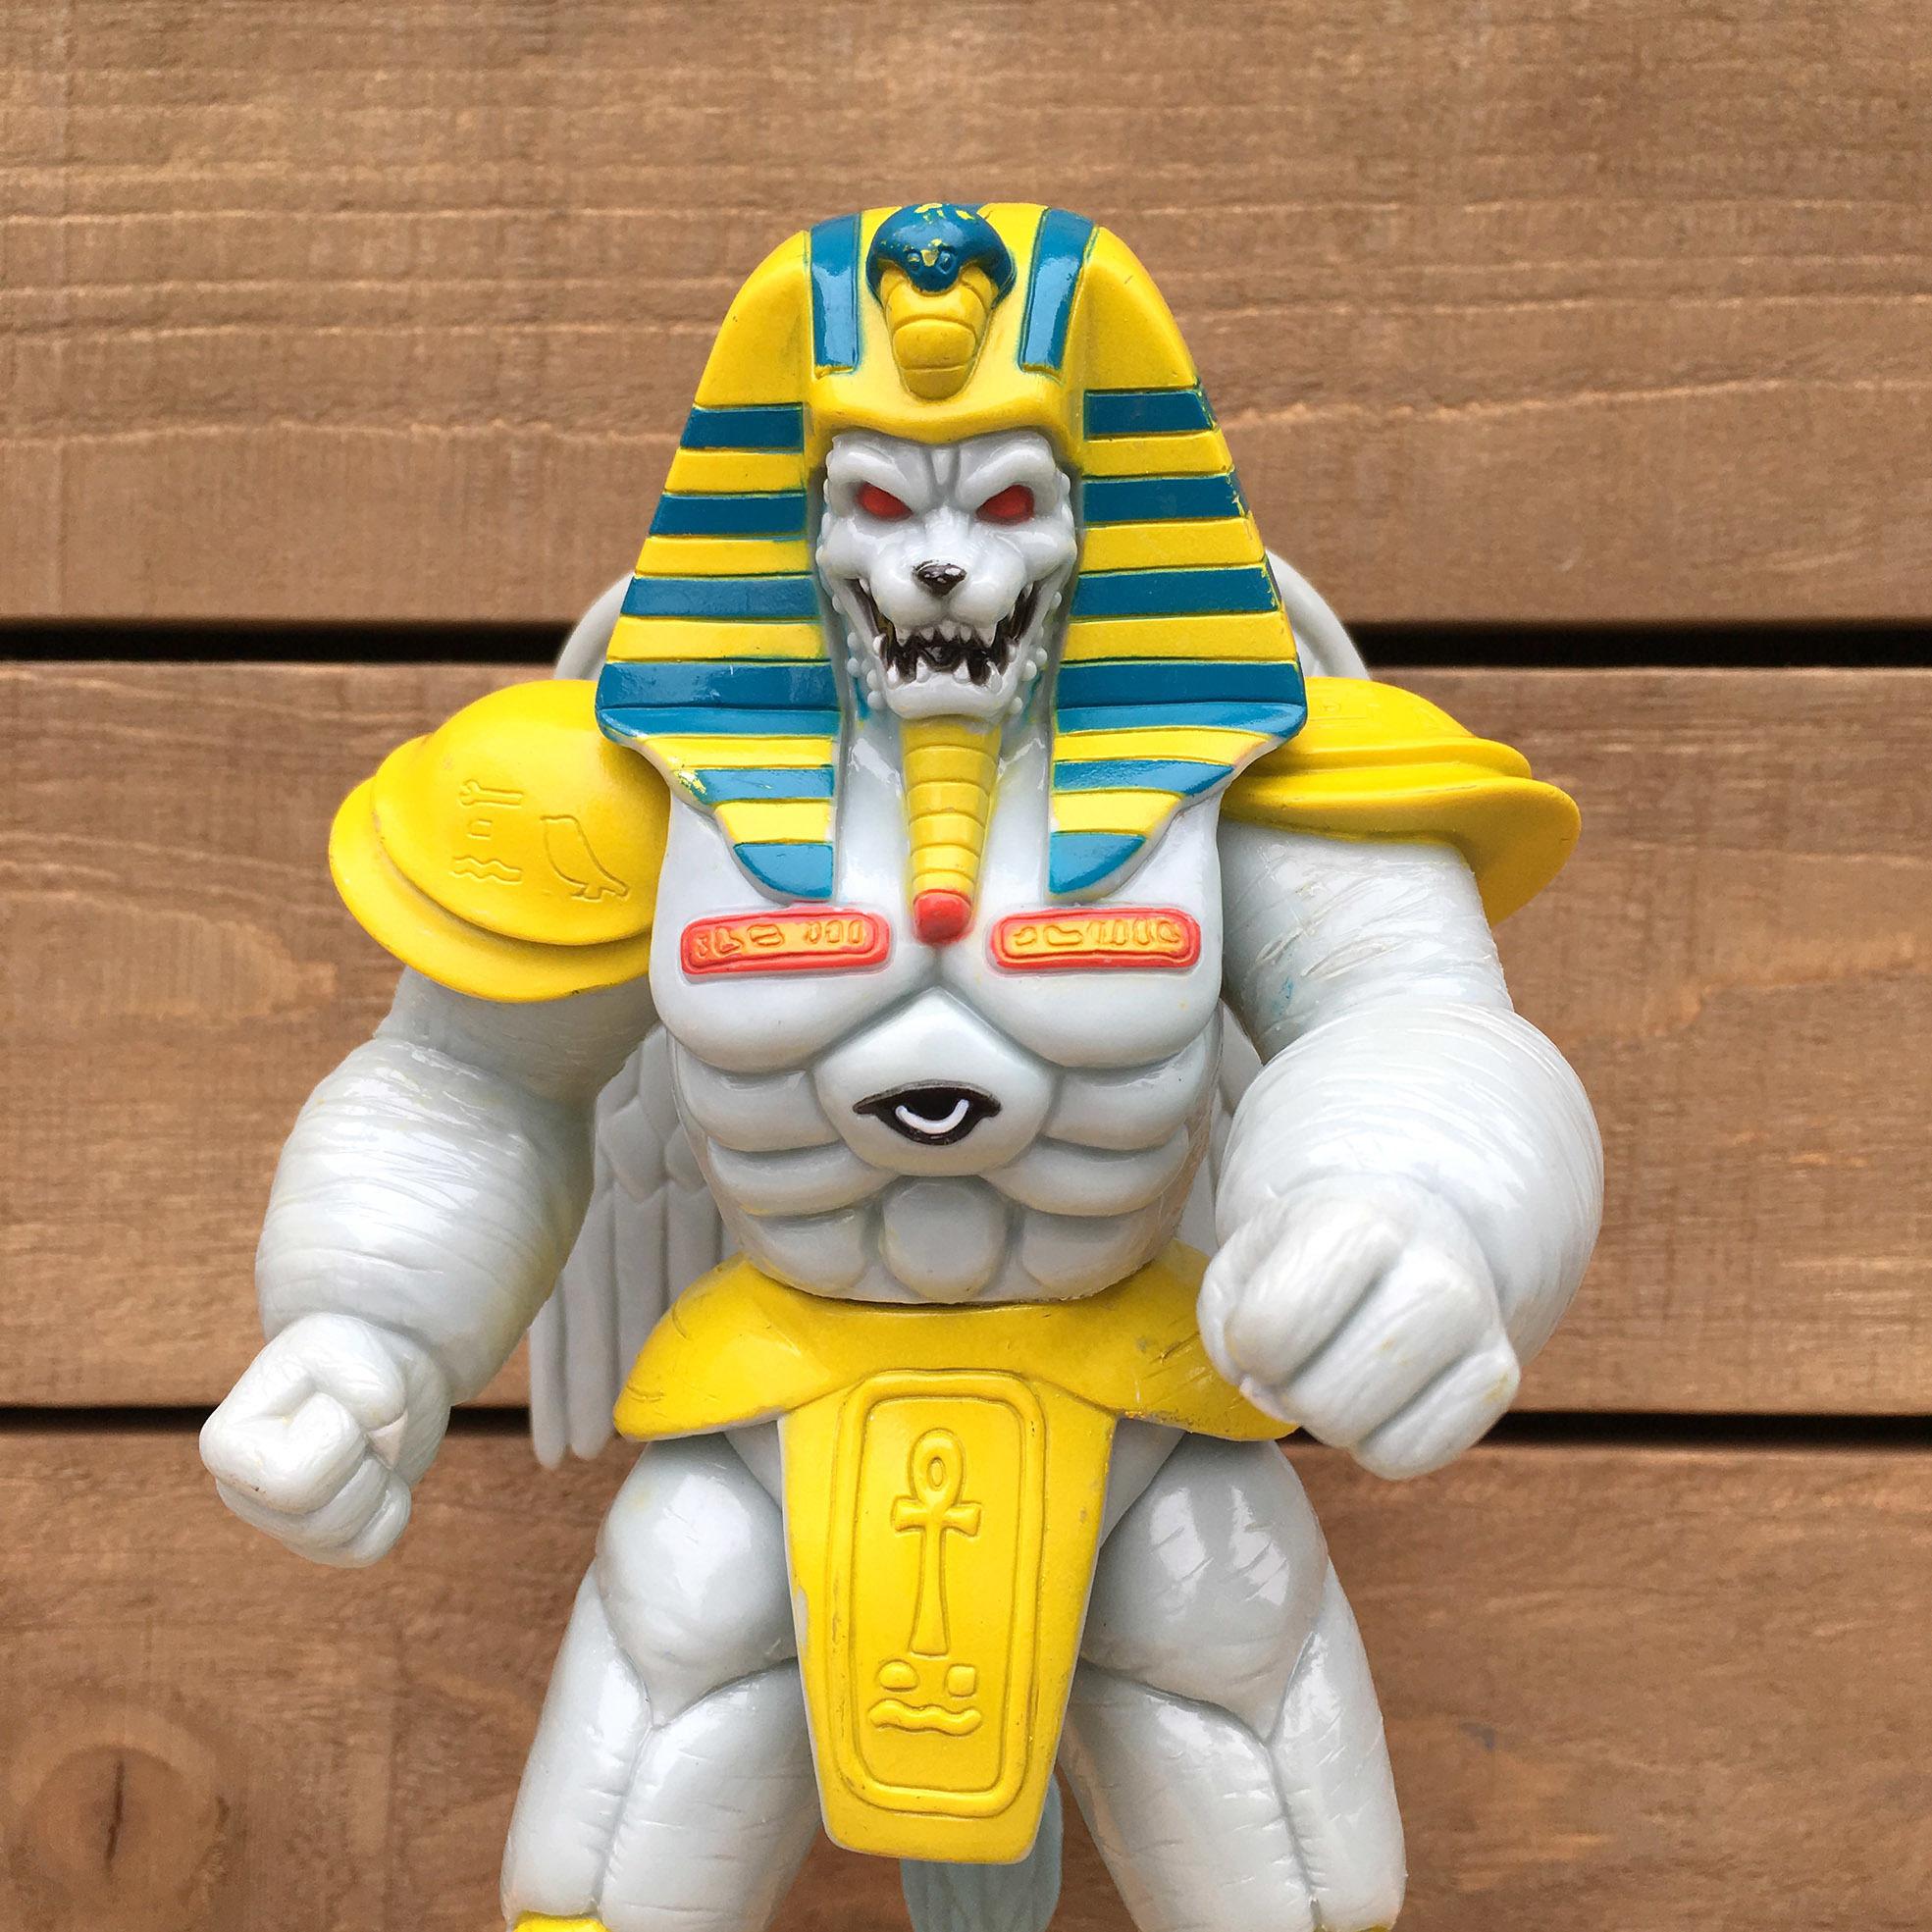 POWER RANGERS 8Inch King Sphinx/パワーレンジャー 8インチ キングスフィンクス フィギュア/170417-7